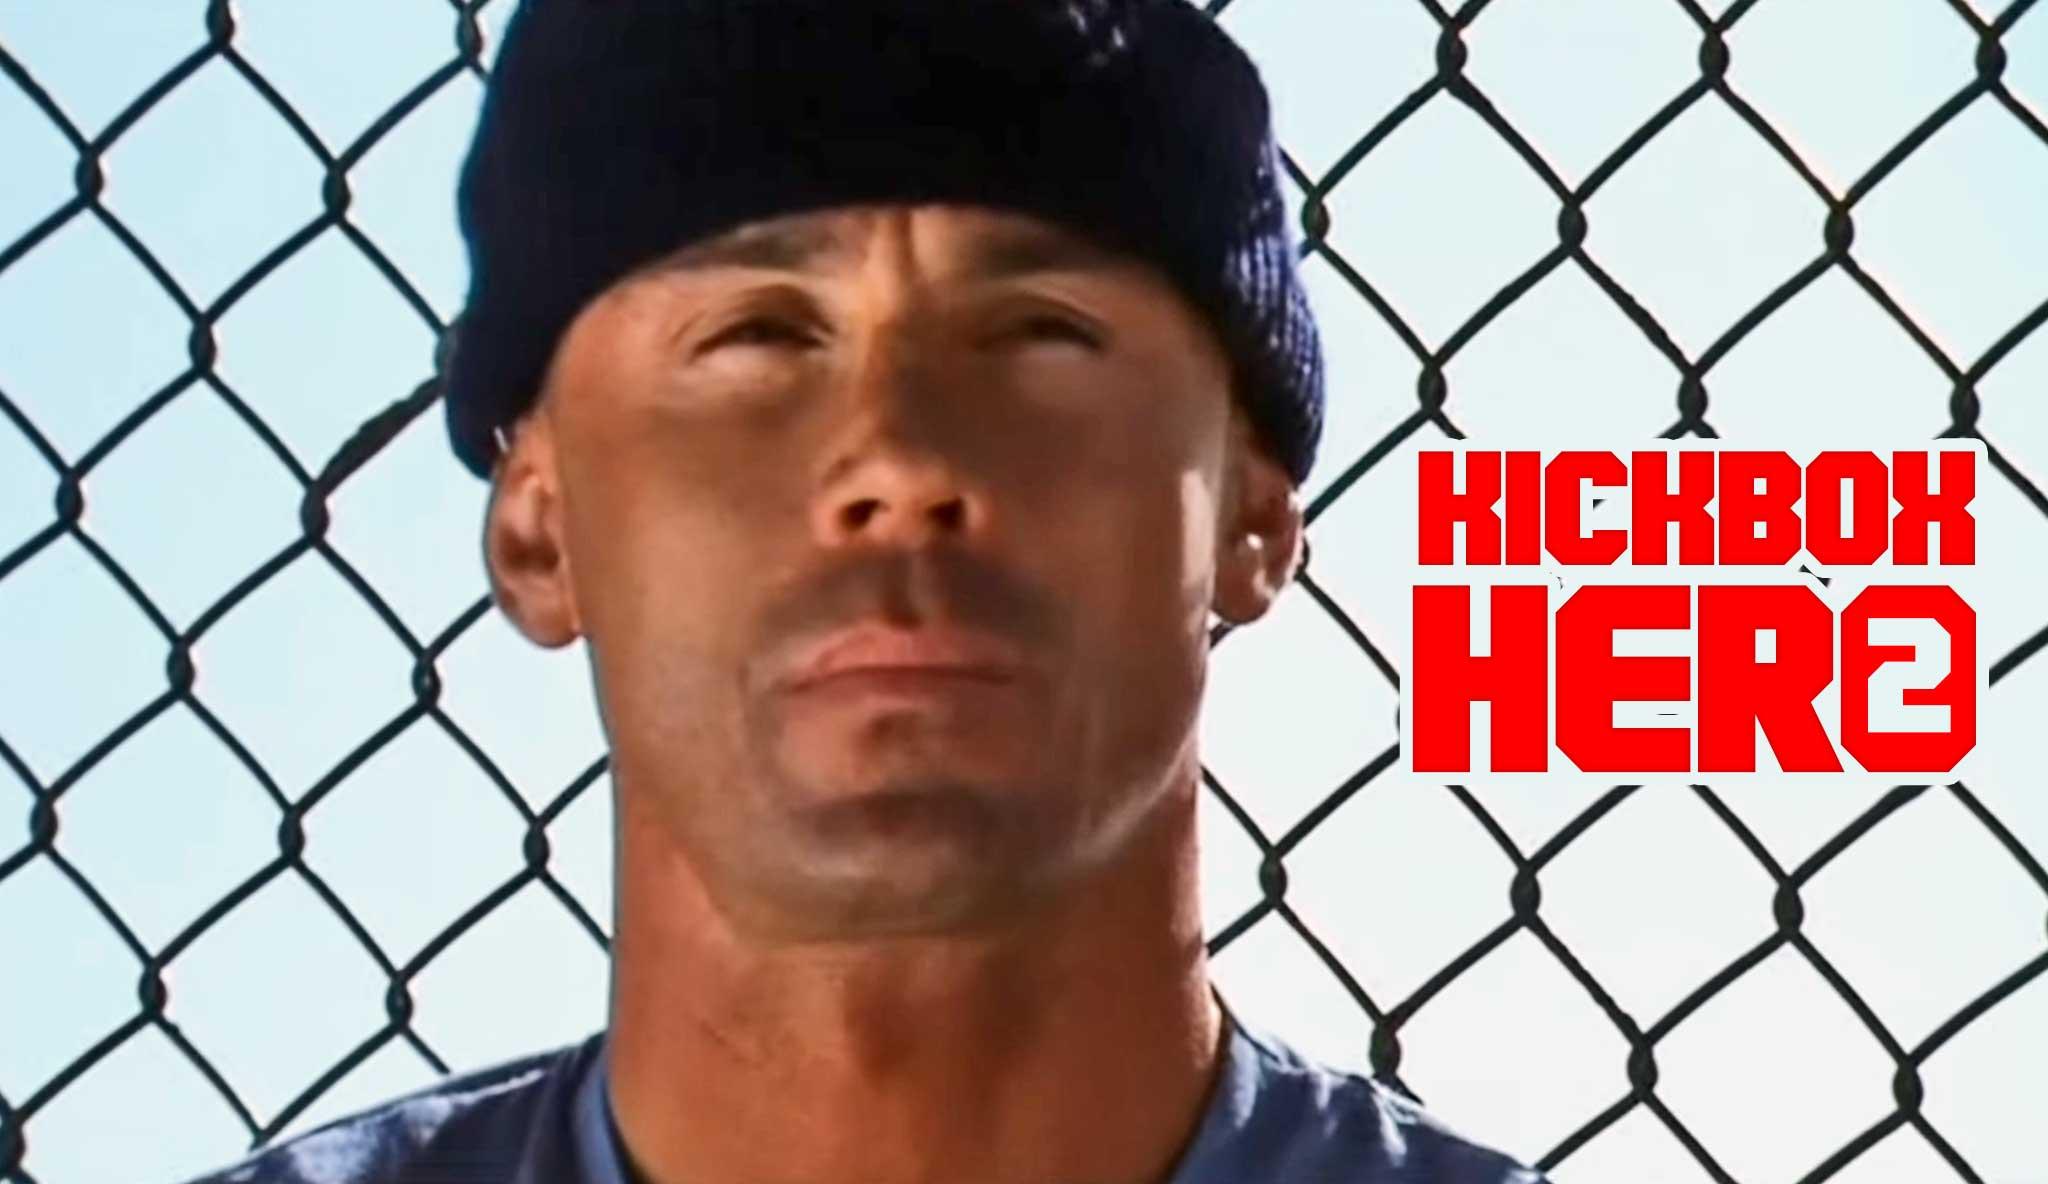 kickbox-hero-2\header.jpg